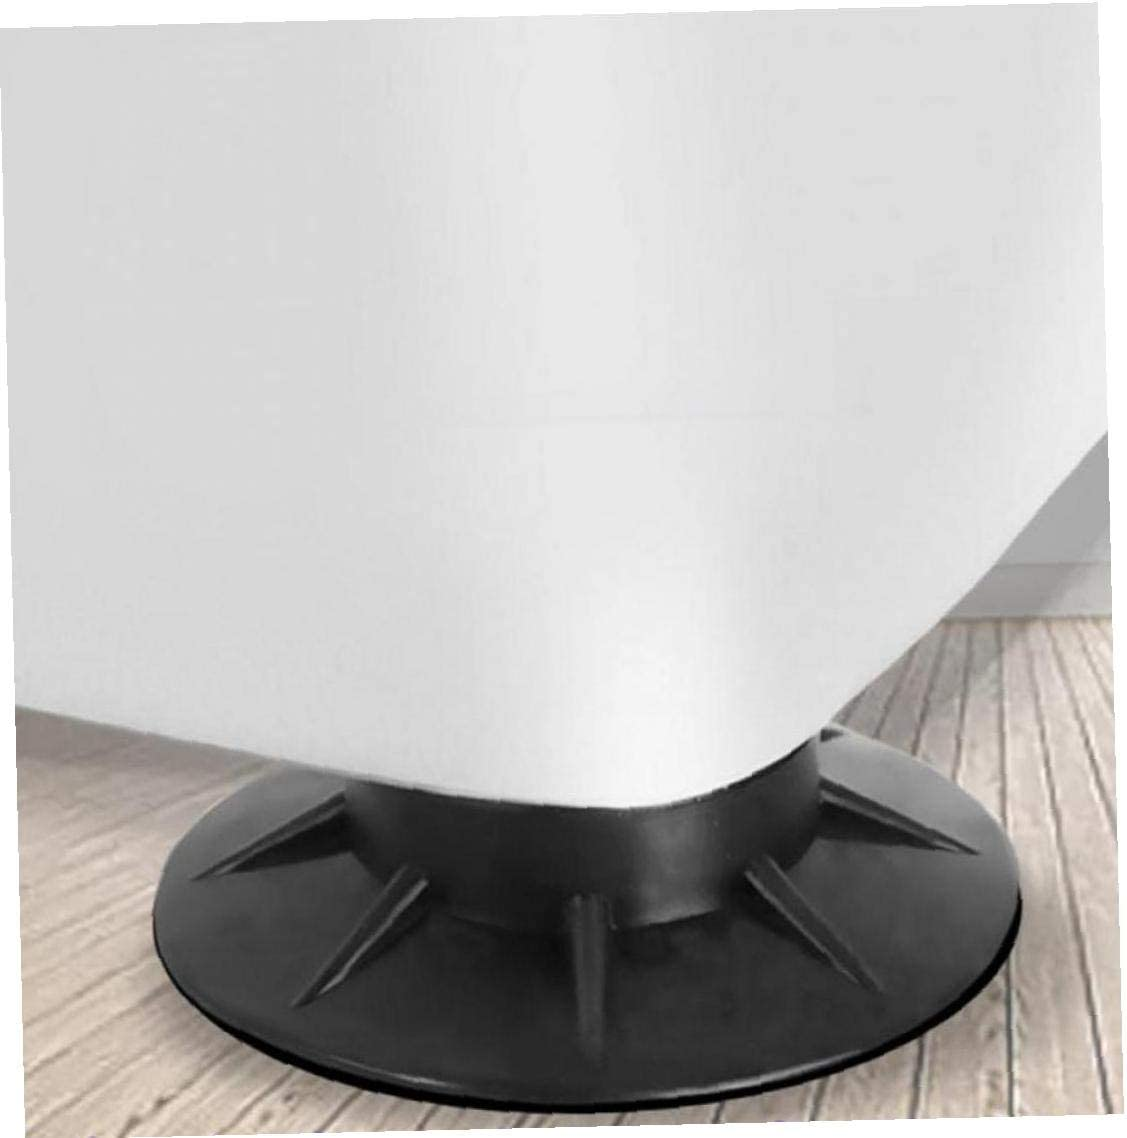 Bontand 4 Pcs Floor Mat Elasticity Furniture Anti Vibration Protectors Rubber Feet Pads for Refrigerator Chair Cushion Pad Furnitures Anti Slip Pad